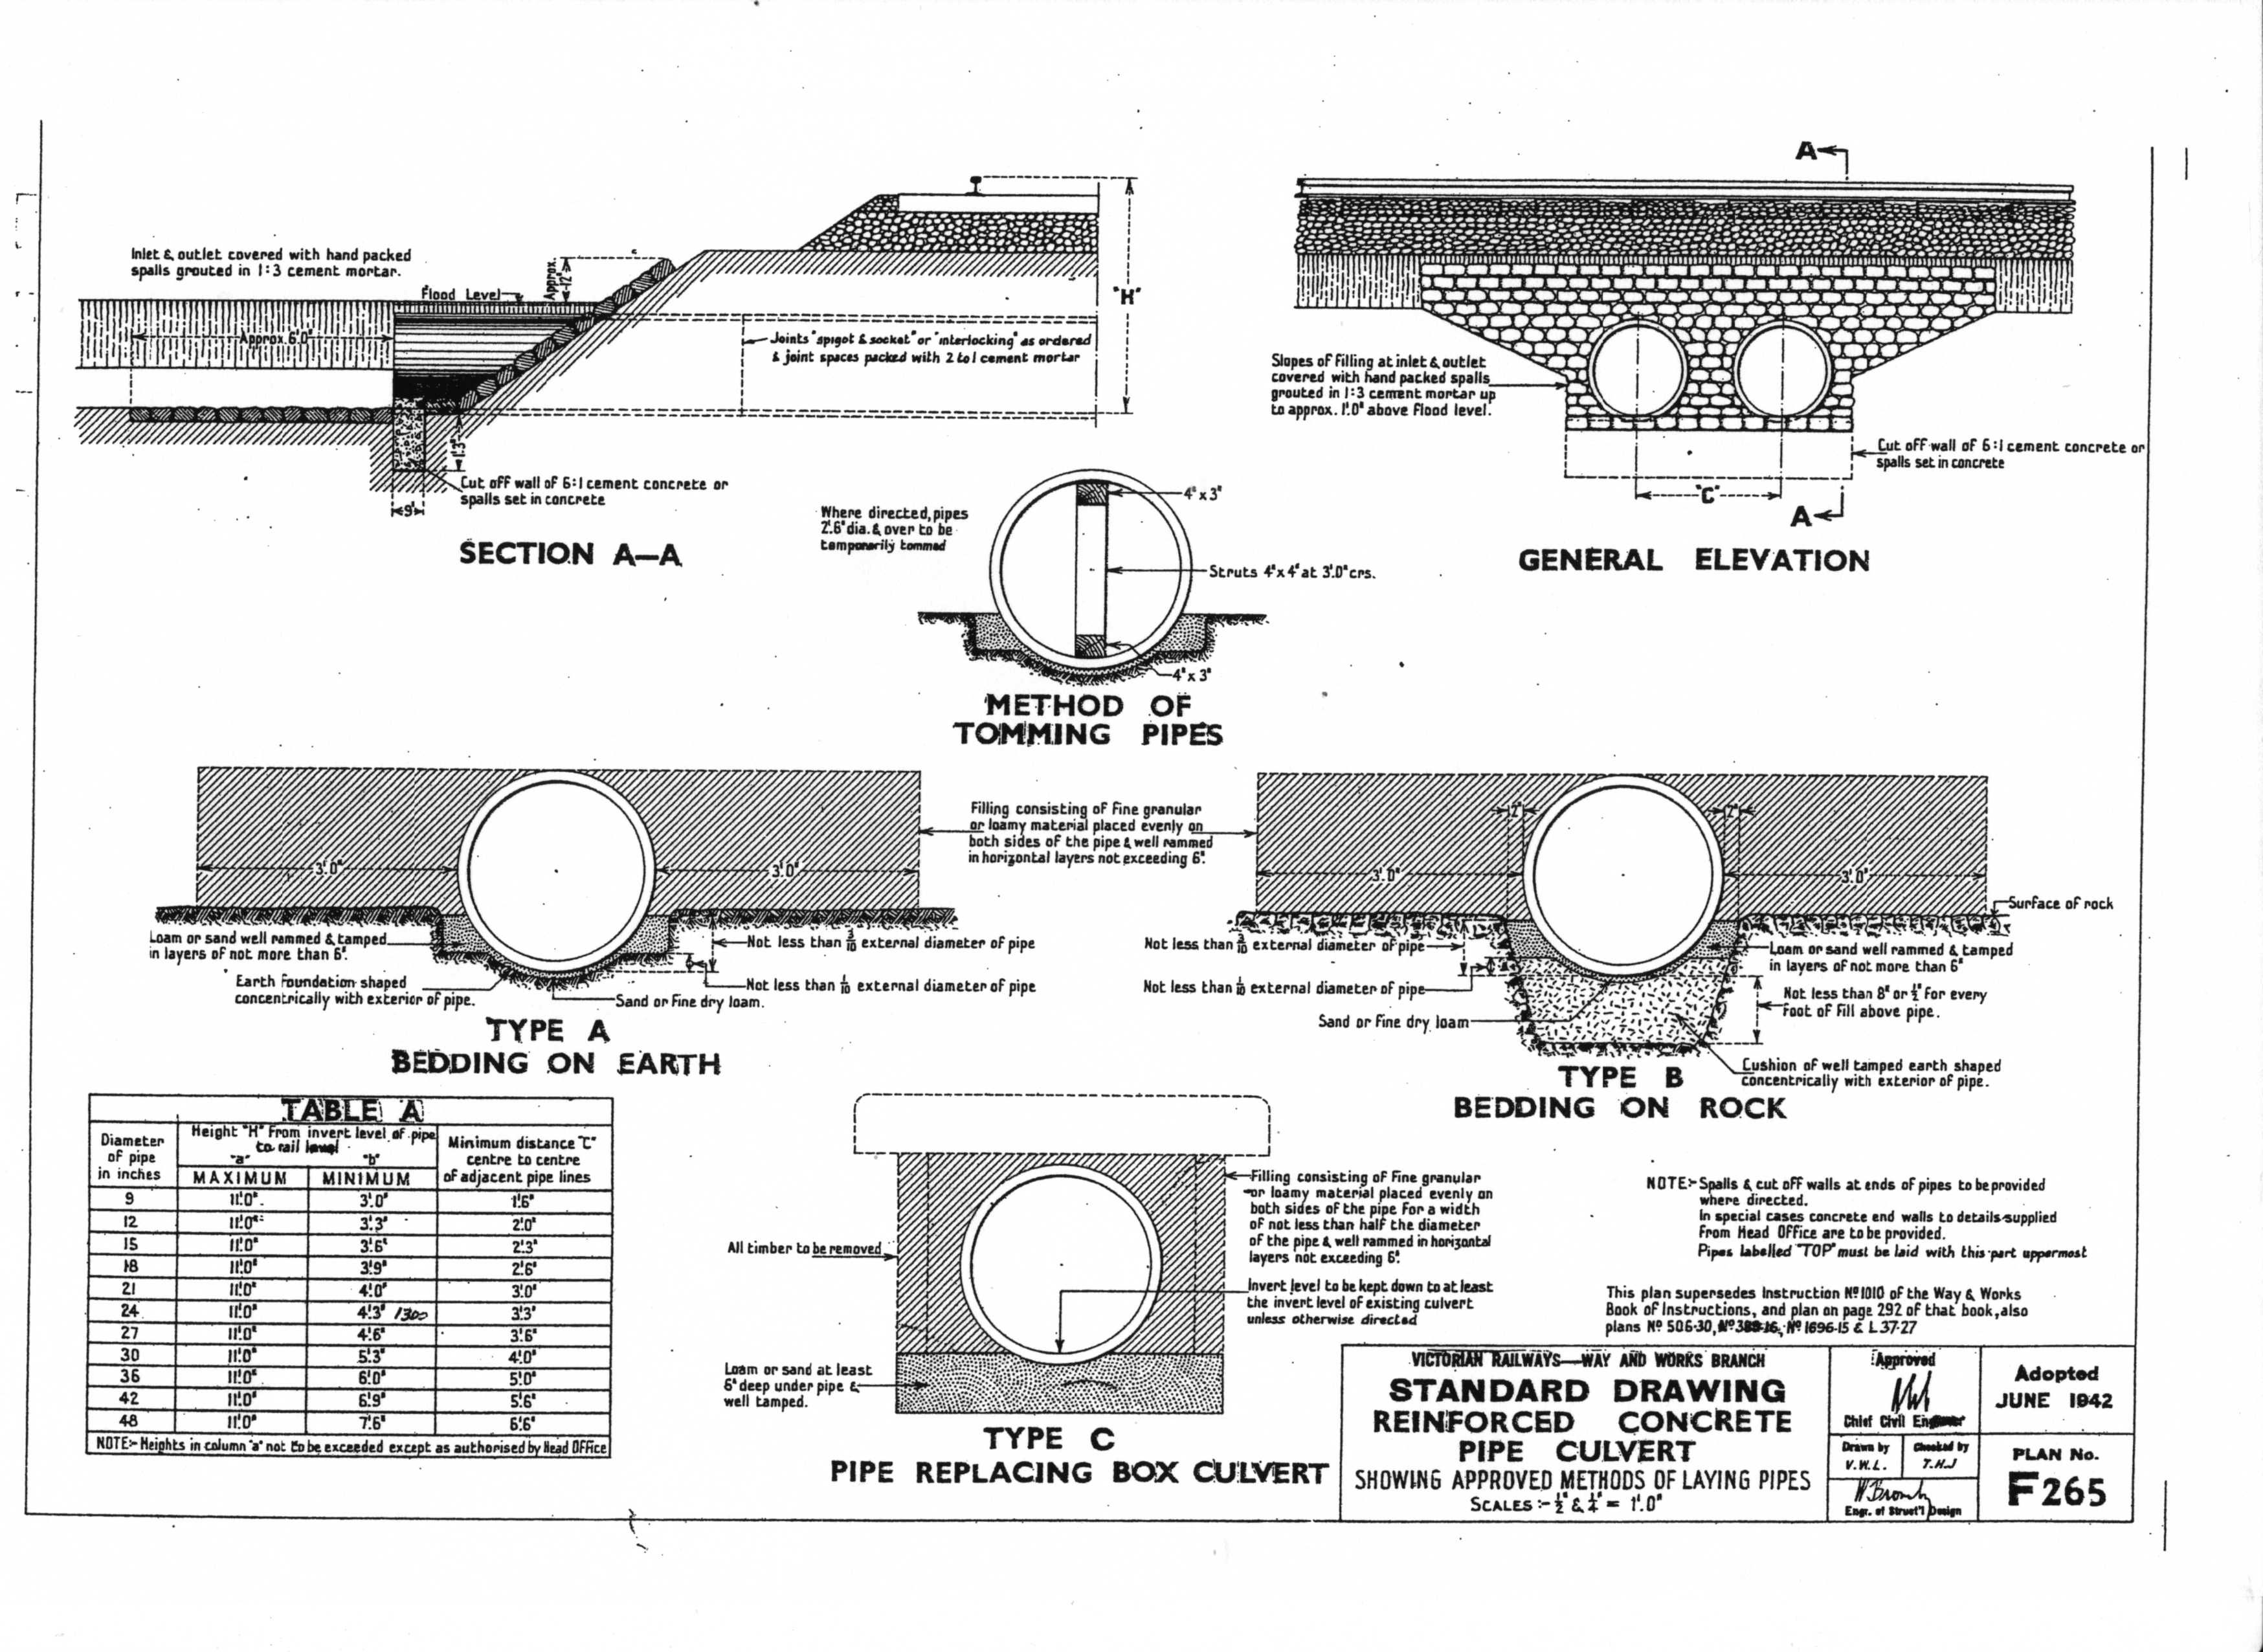 [QMVU_8575]  Pin by Lugene Bradley on CSM - MA | Culvert, Driveway culvert, Driveway | Light Wiring Diagram 110v Driveway |  | Pinterest